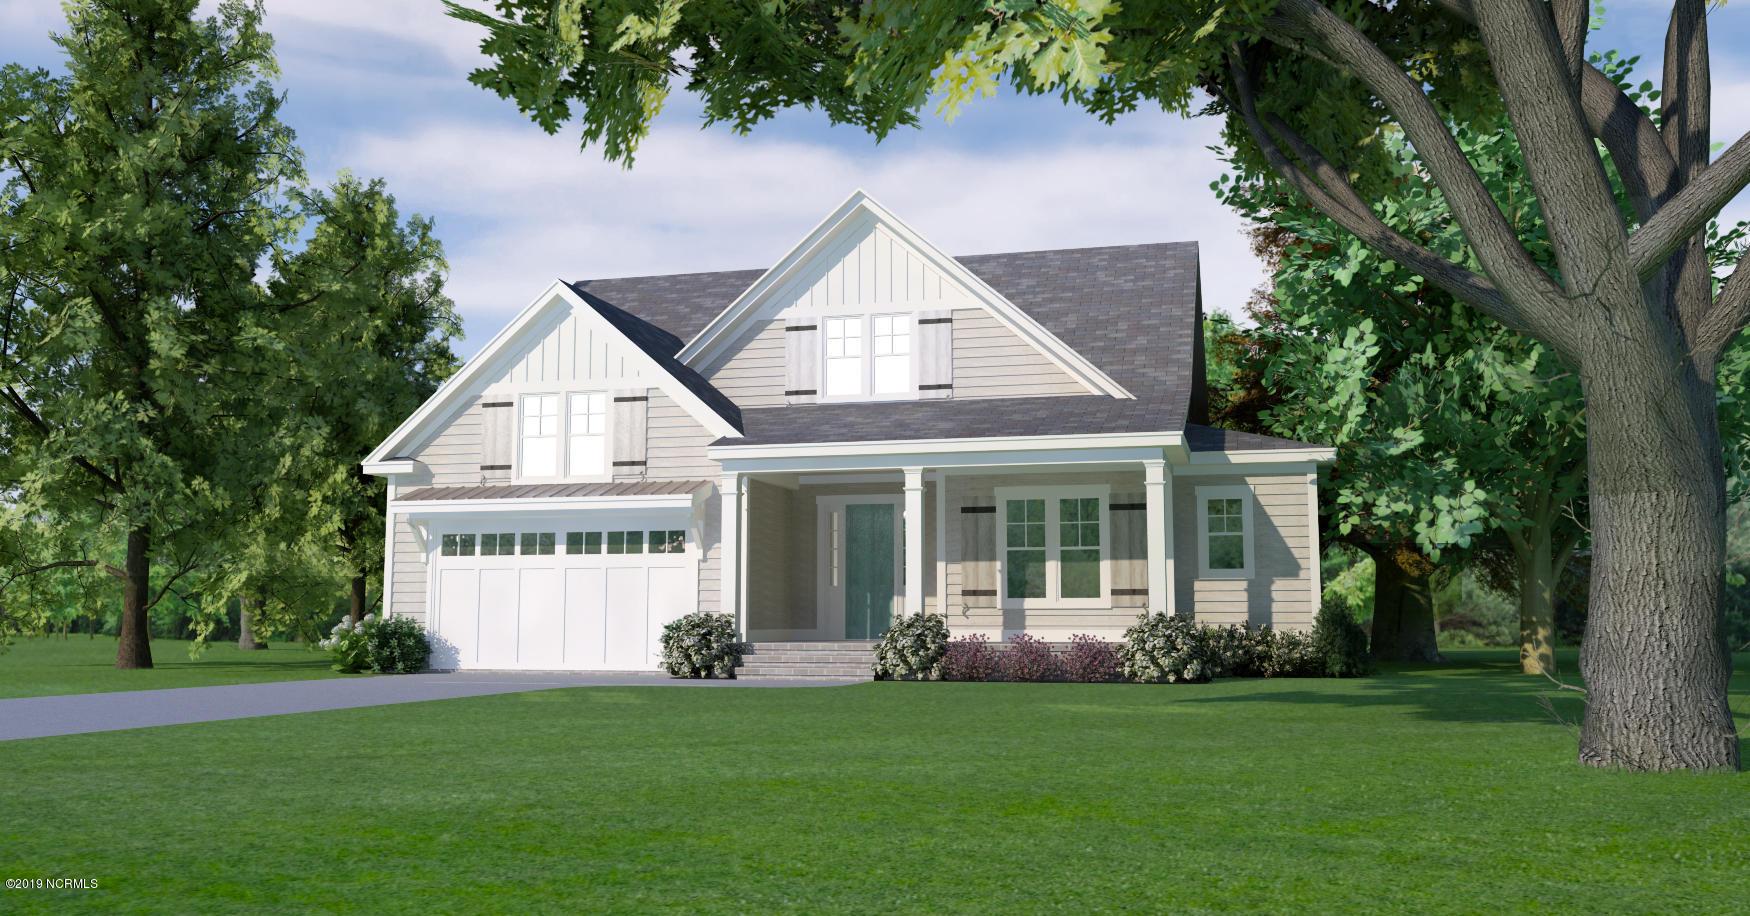 516 Edgerton Drive Wilmington, NC 28412